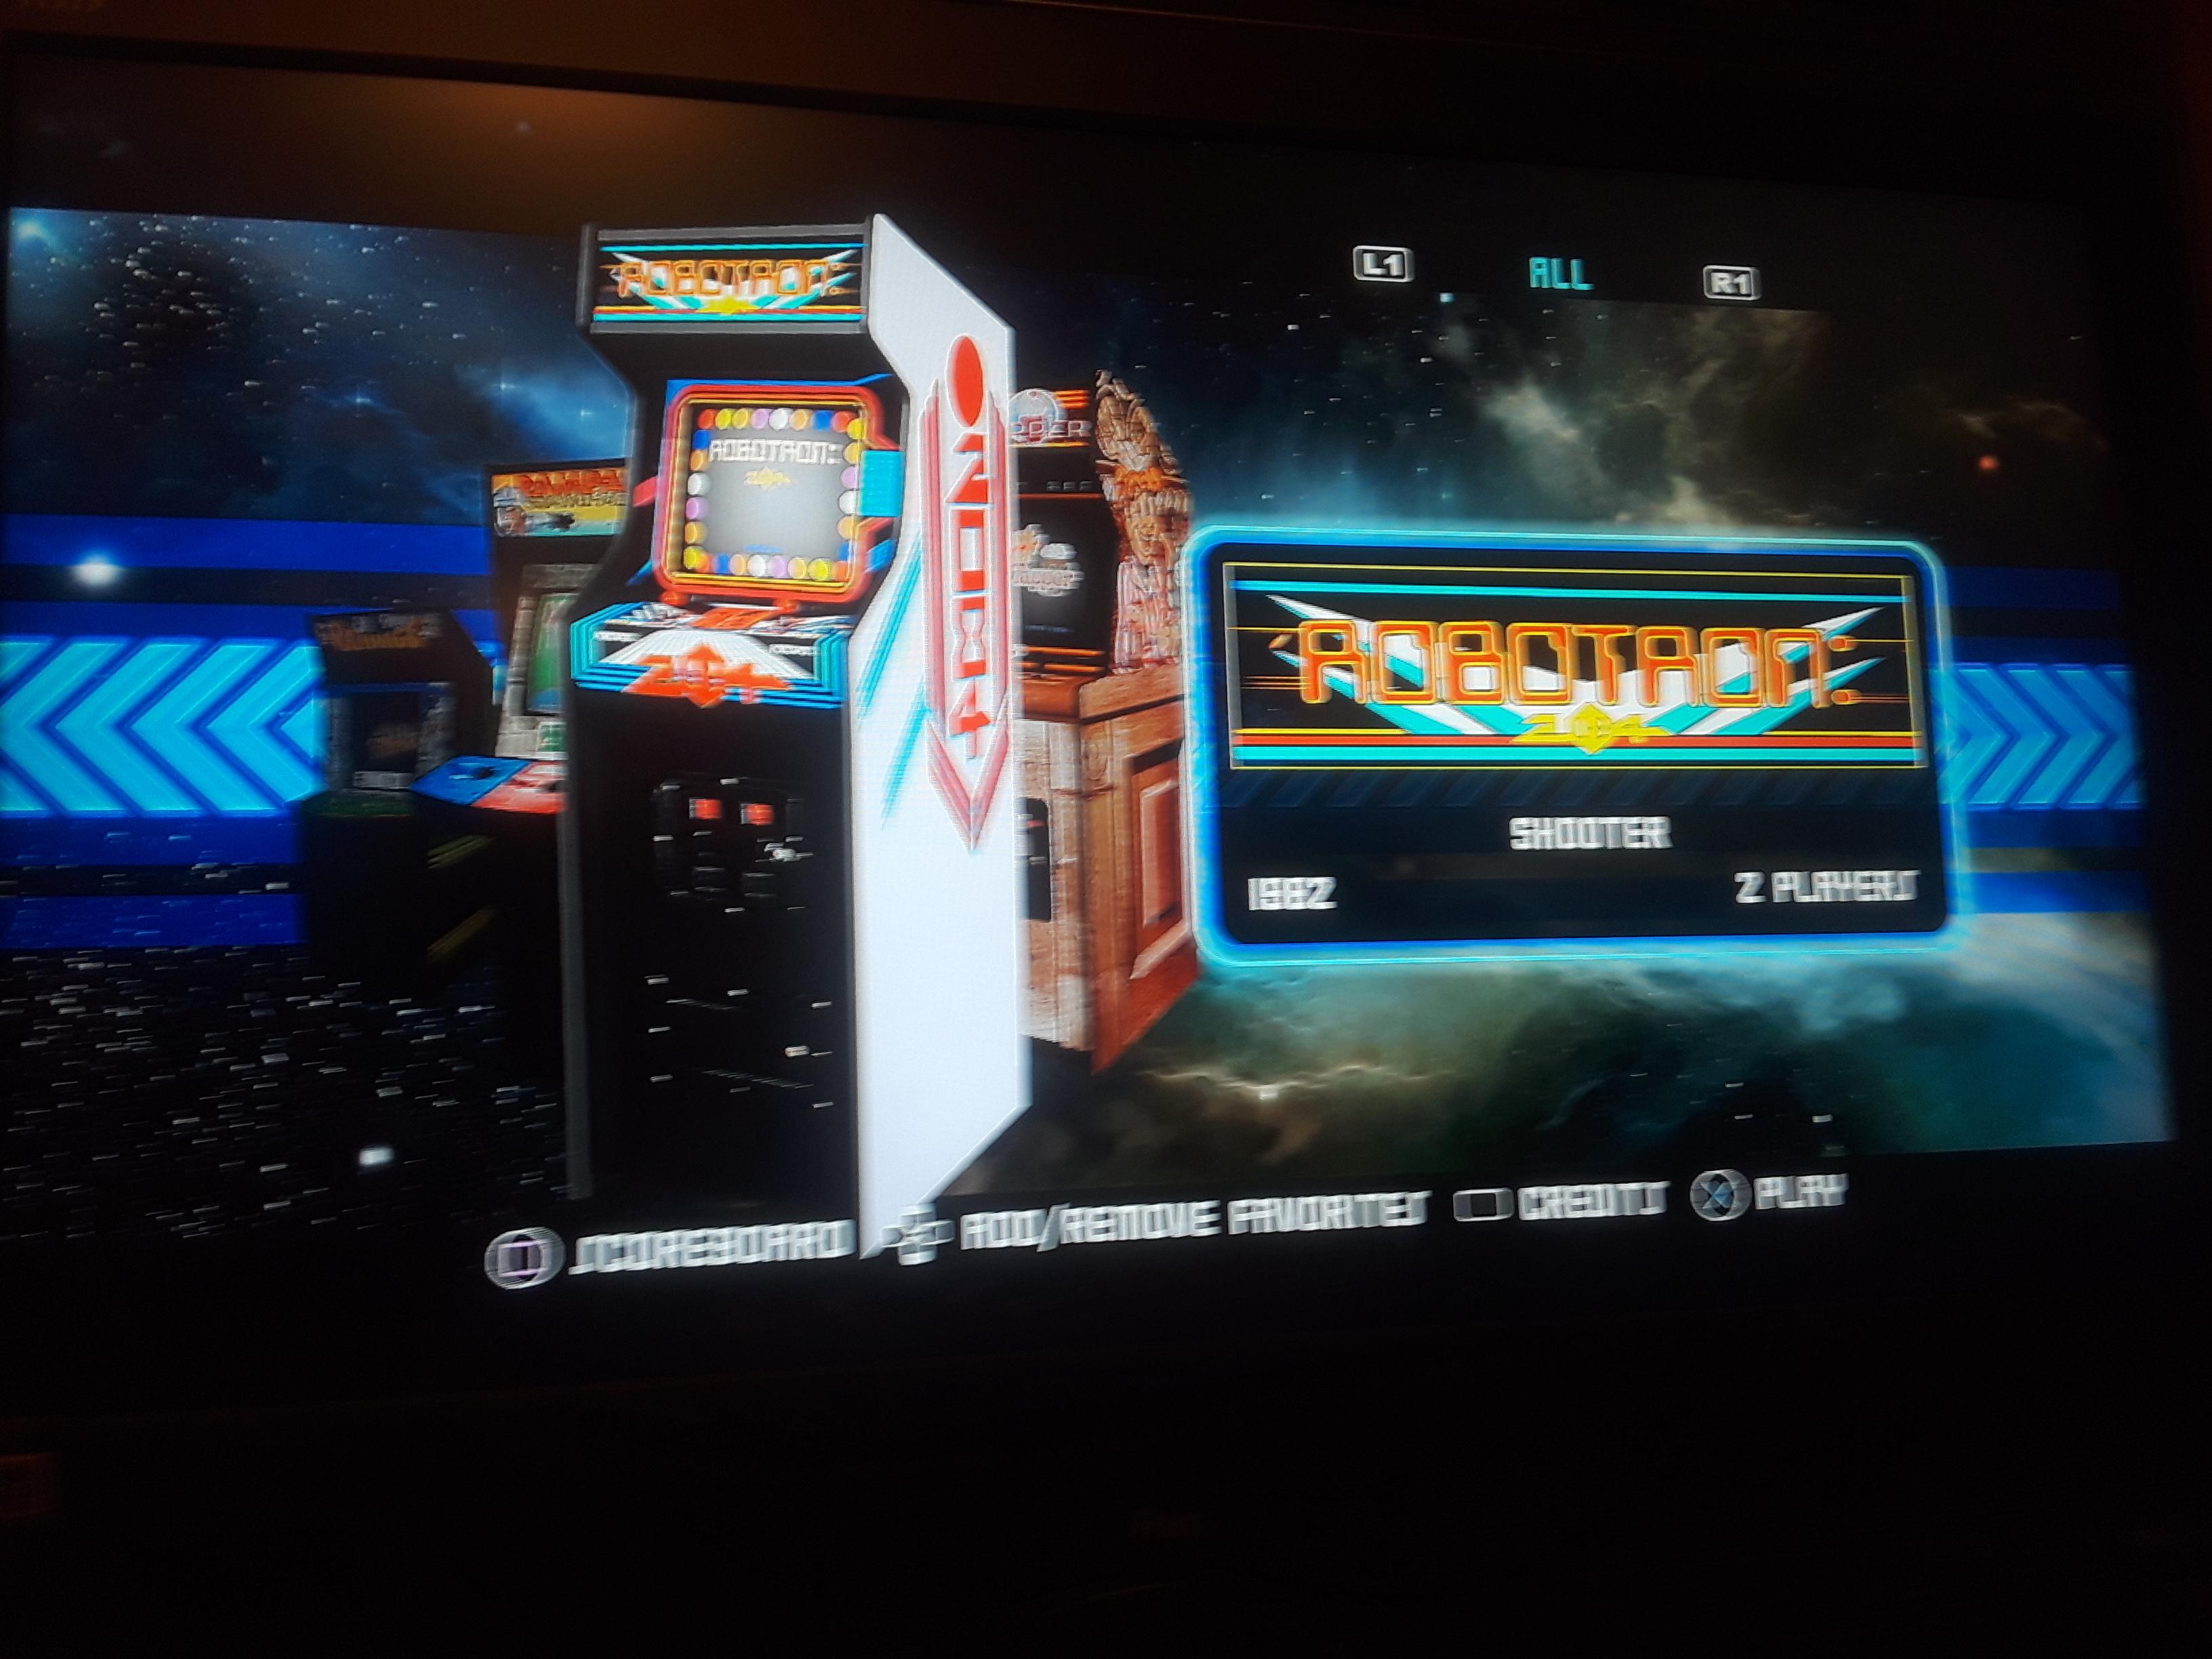 Midway Arcade Origins: Robotron 2084 23,825 points